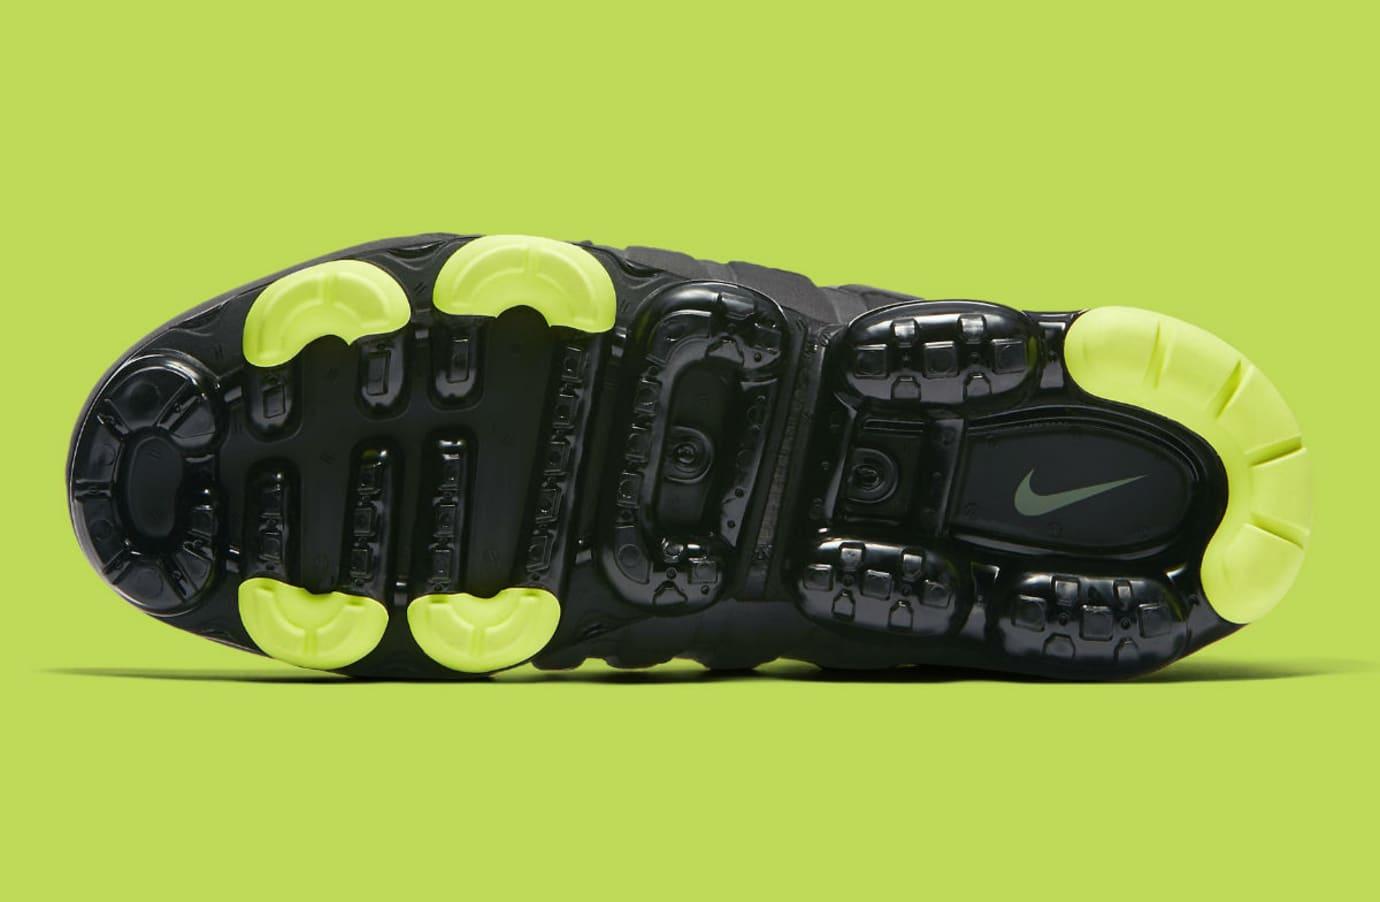 d4337dd6cf2 Image via Nike Nike Air VaporMax 95 Black Volt Medium Ash Dark Pewter Dusk  Granite Release Date AJ7292-